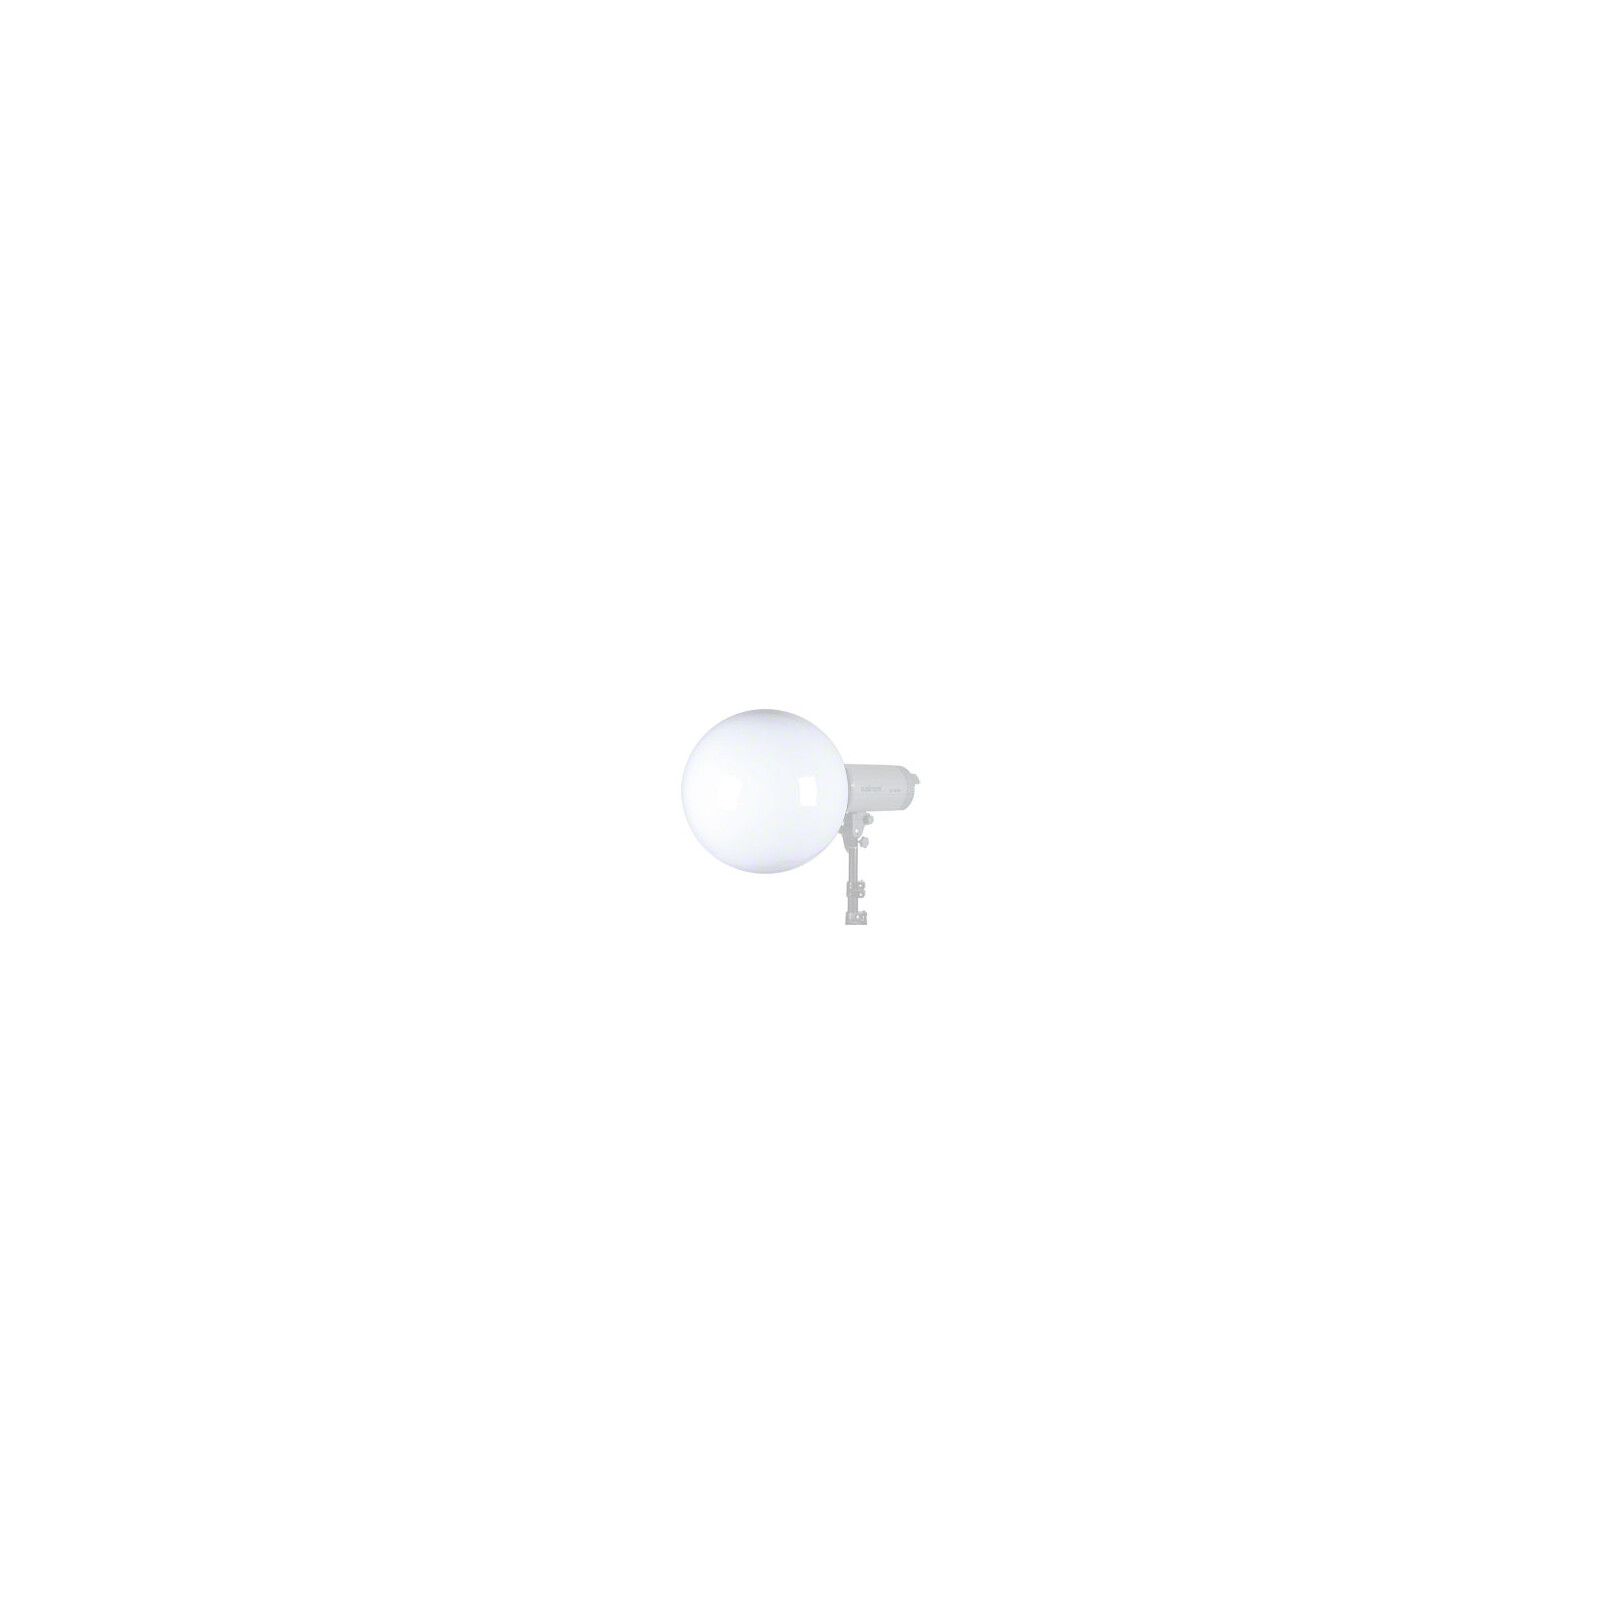 walimex Universal Diffusorkugel, 30cm Mulitblitz V